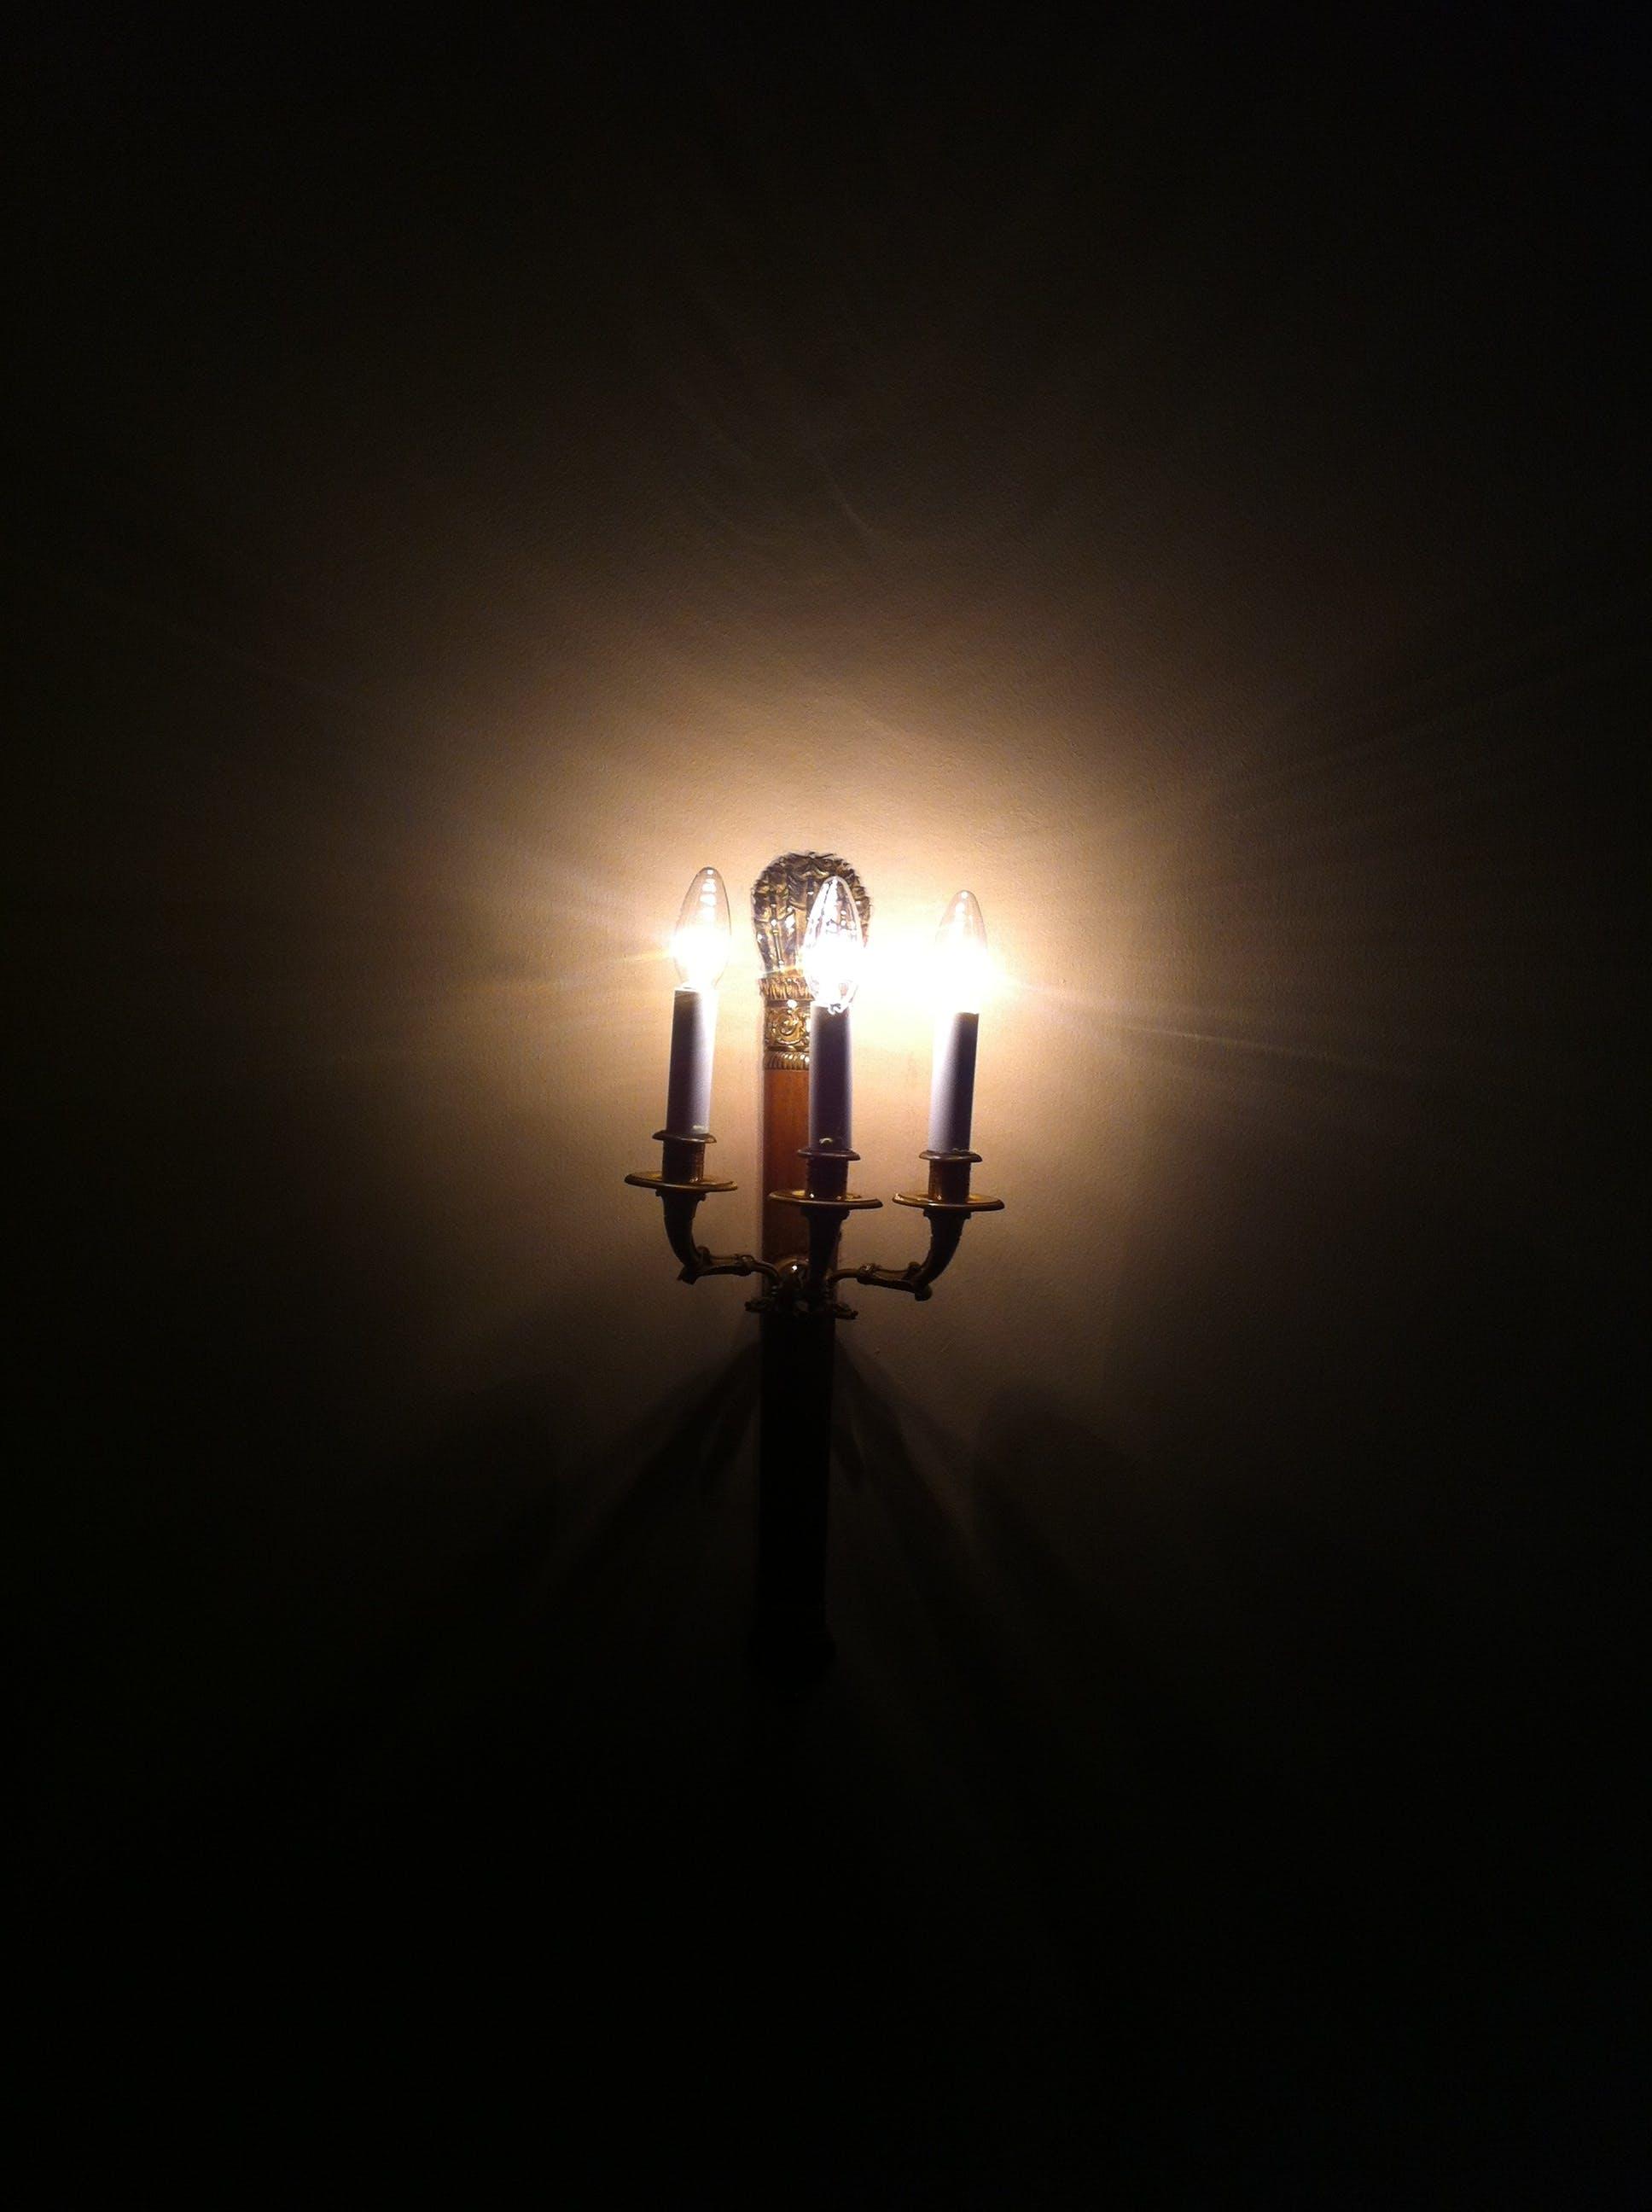 Free stock photo of candlestick, dark, illuminate, lamp